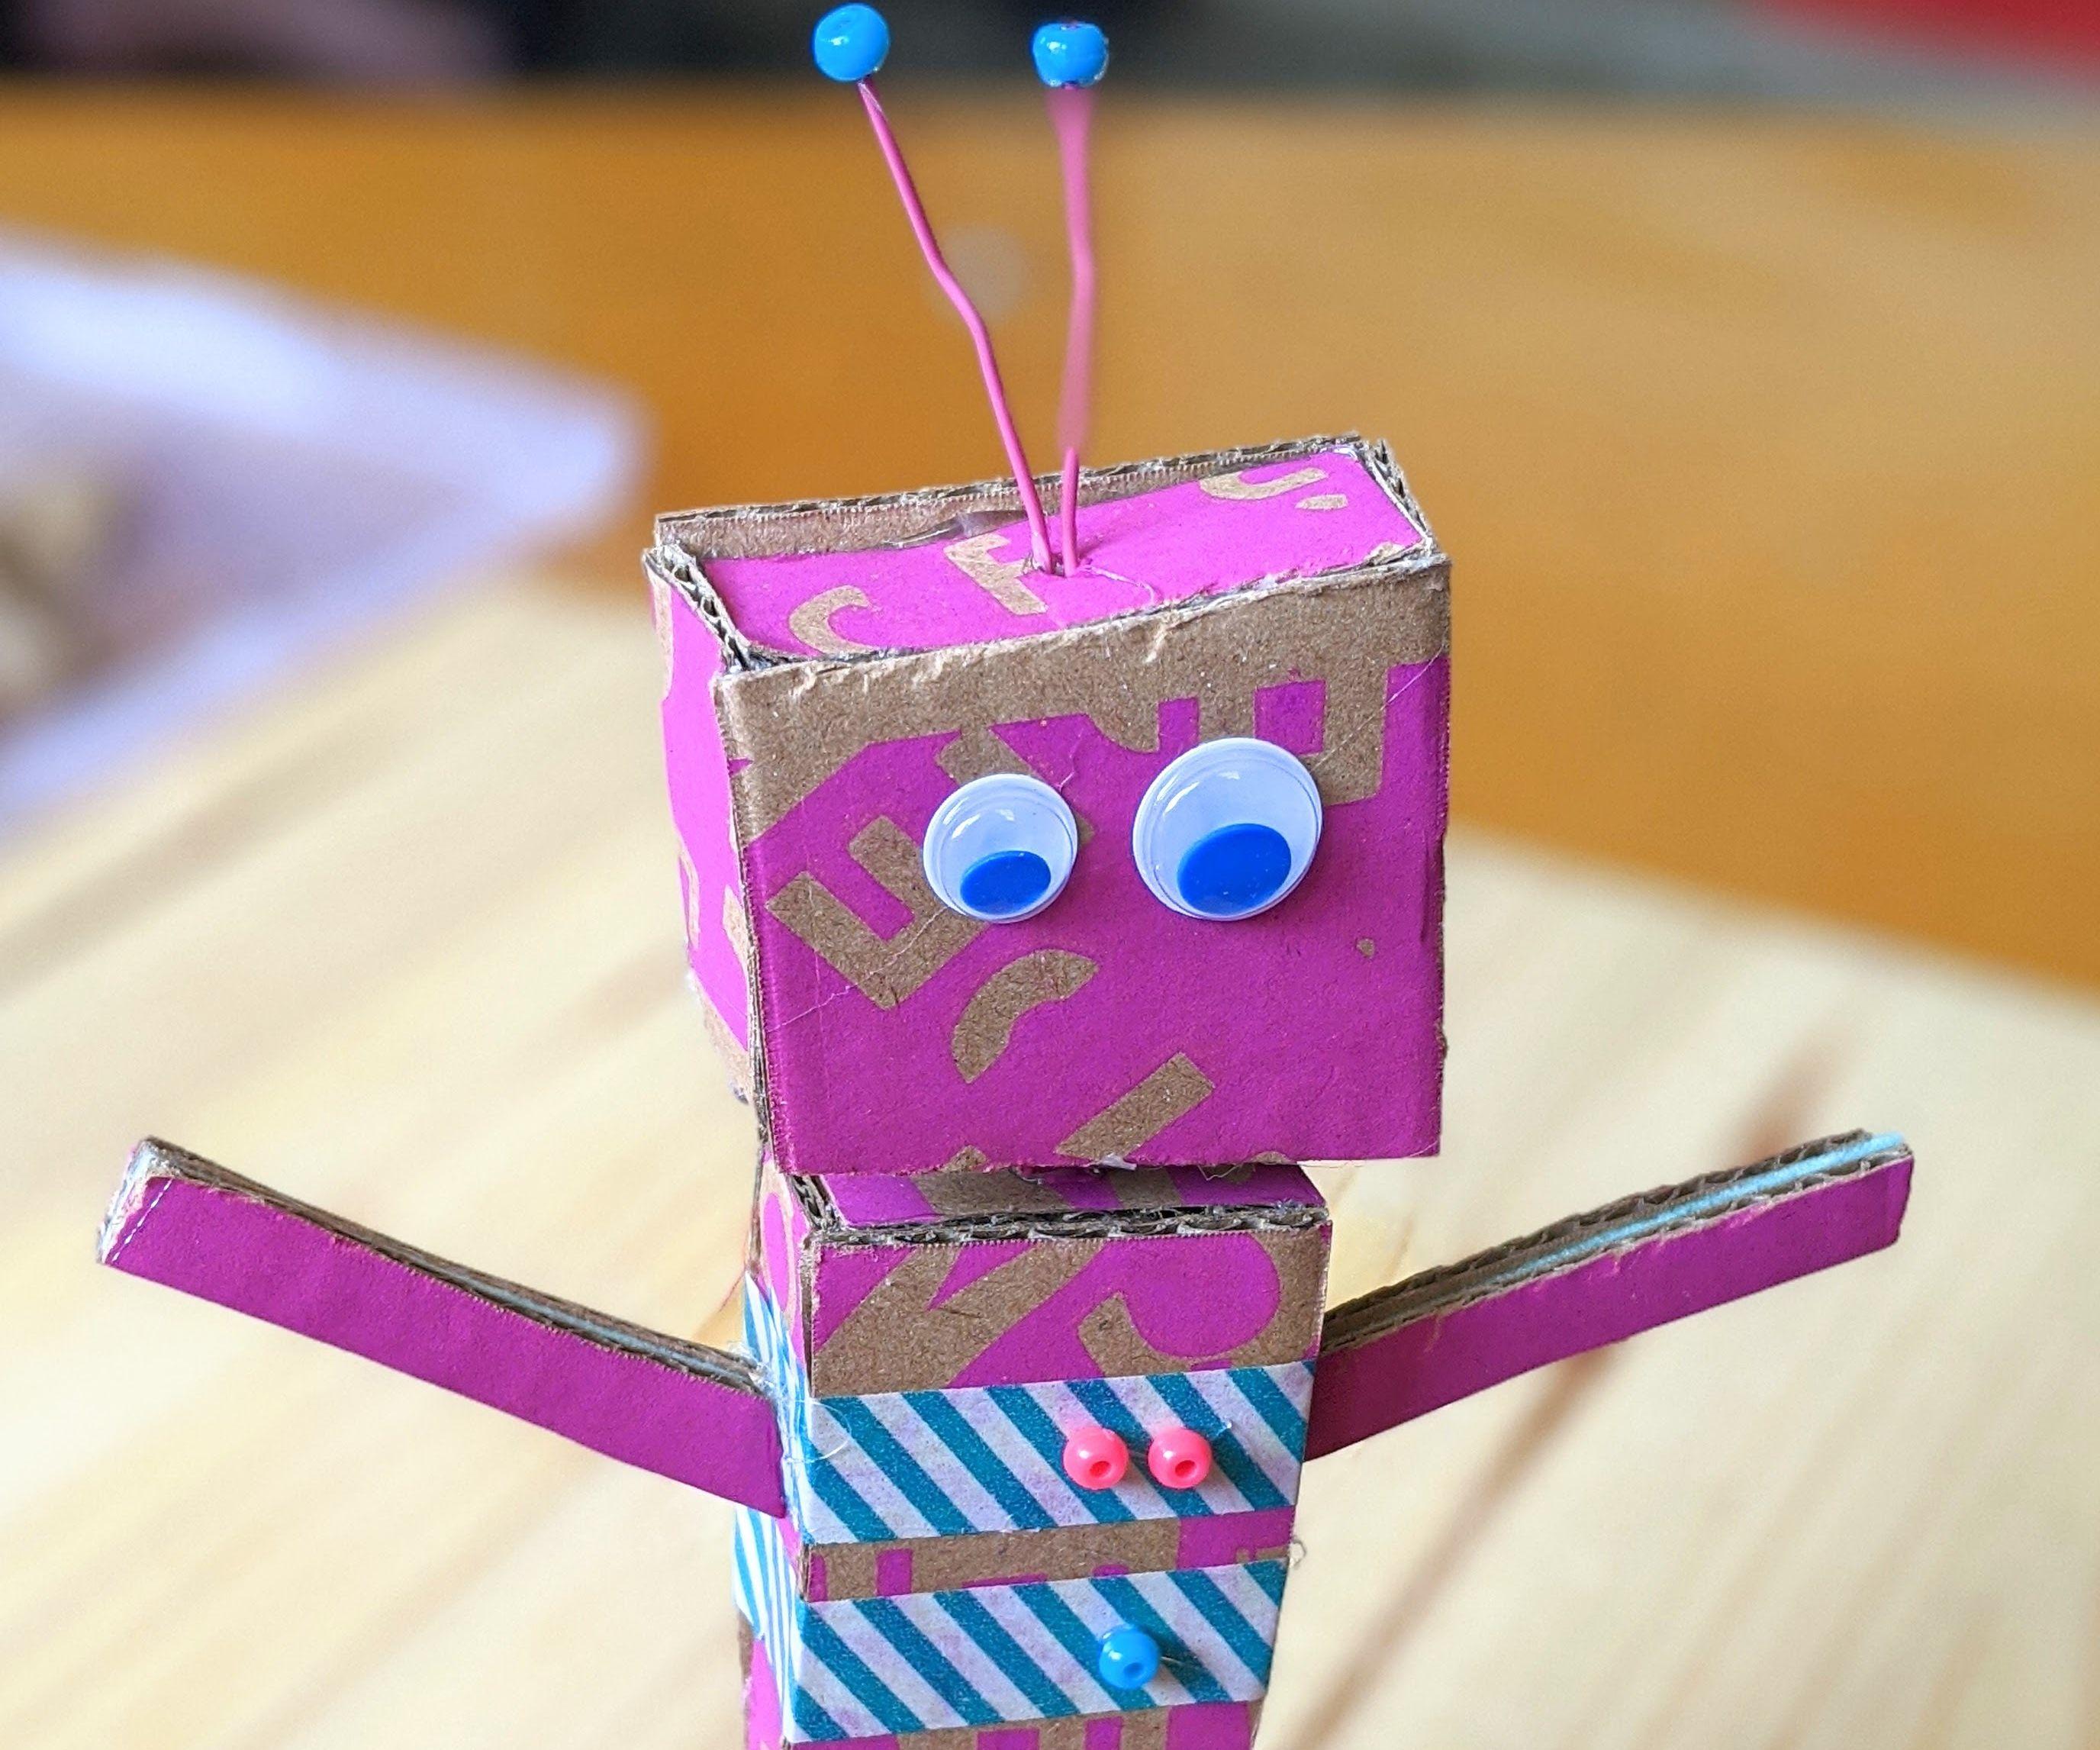 Make a Cardboard Robot